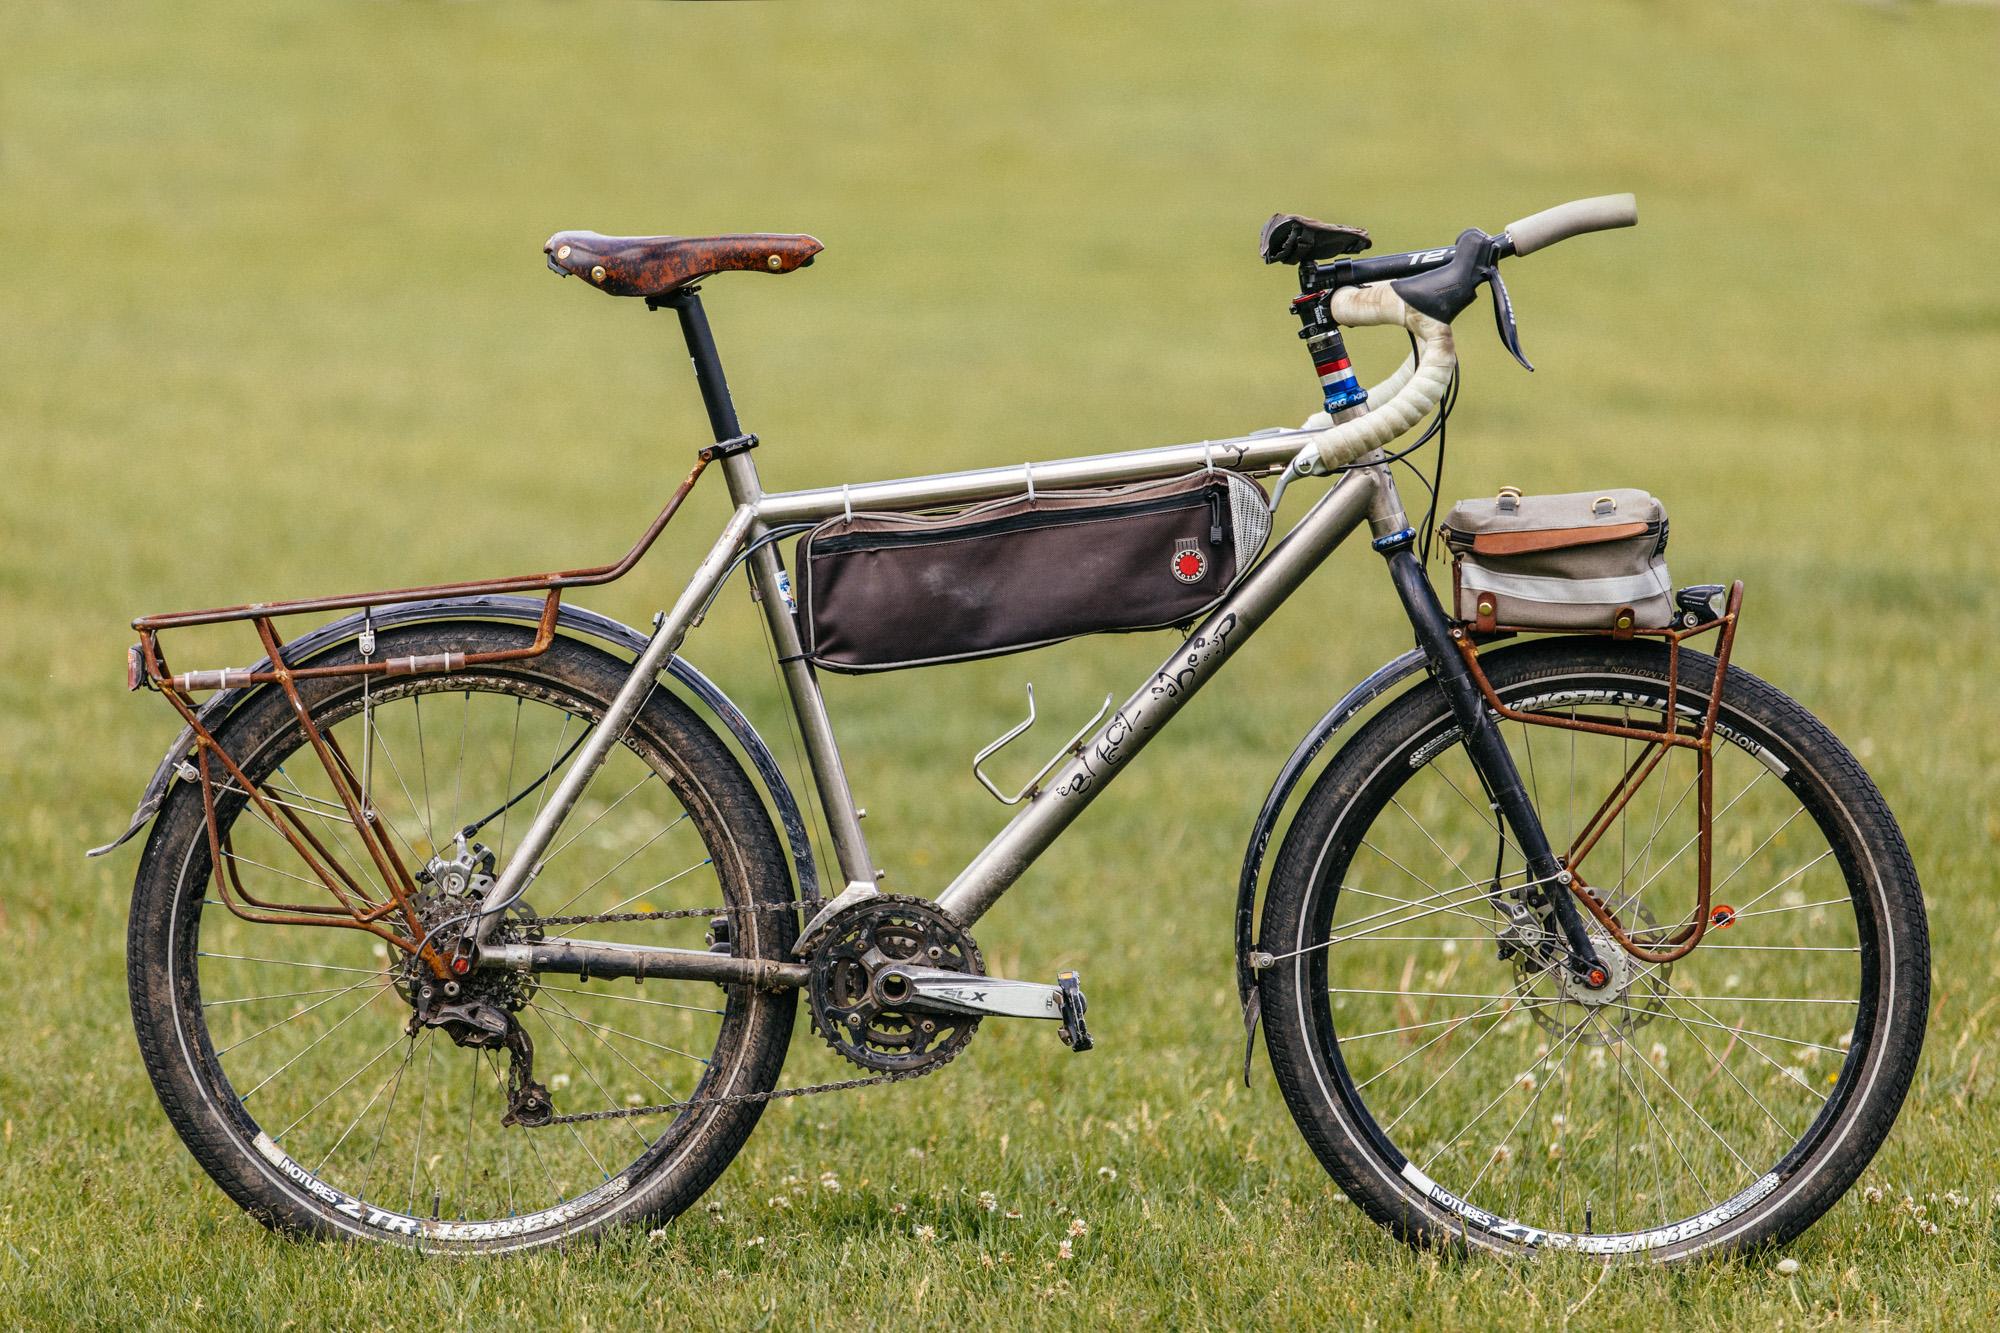 Sam's Black Sheep Lifetime Bike